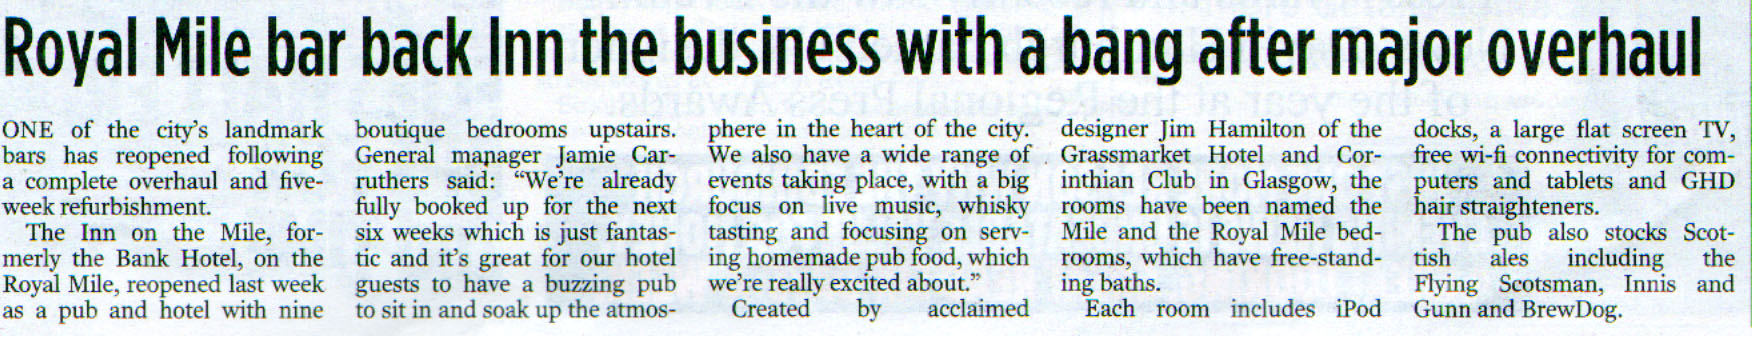 Edinburgh Evening News coverage